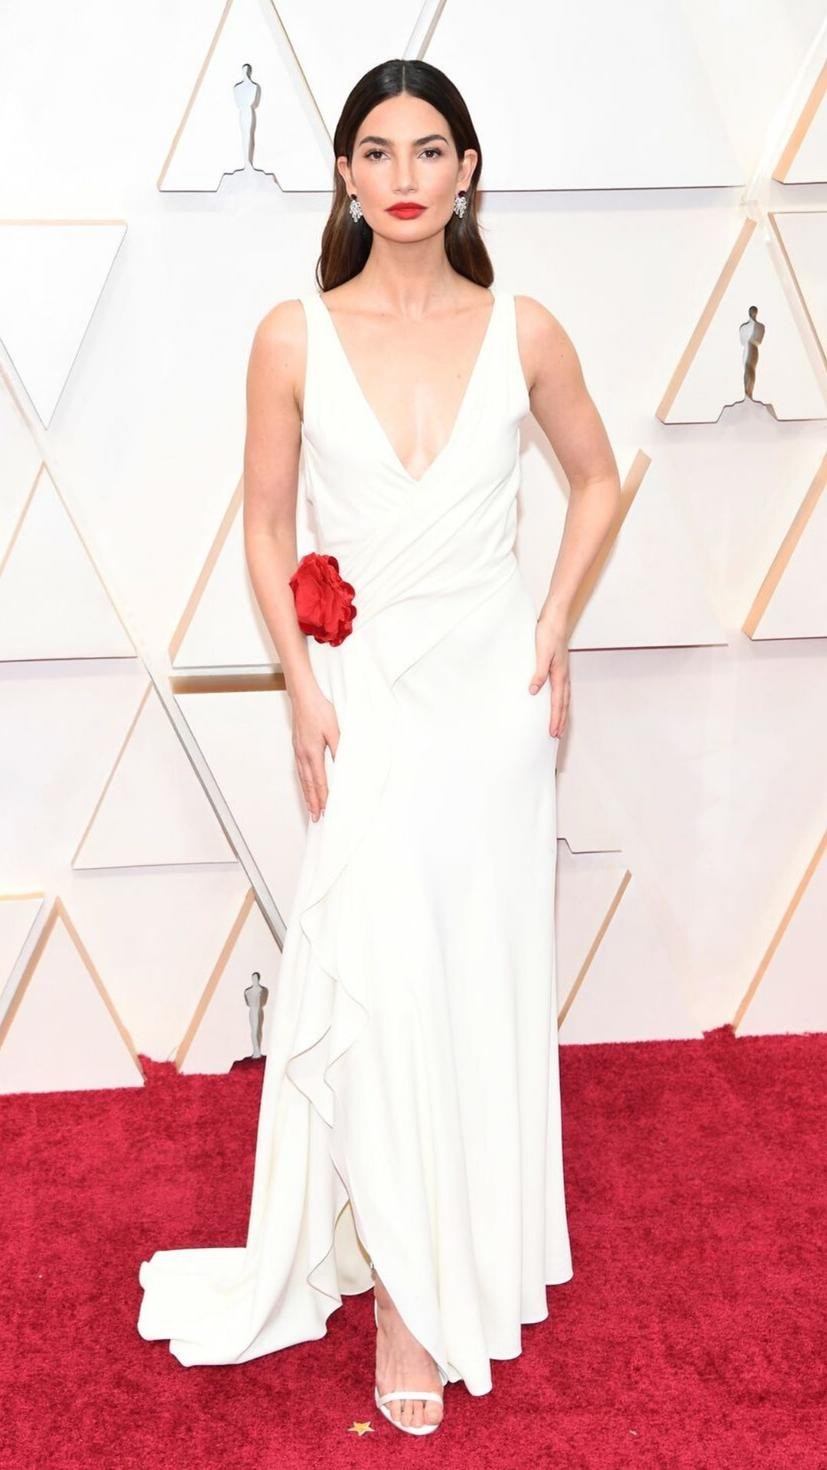 Lily Aldridge wears a dress from Ralph Lauren, heels from Jimmy Choo, and jewellery from Bulgari